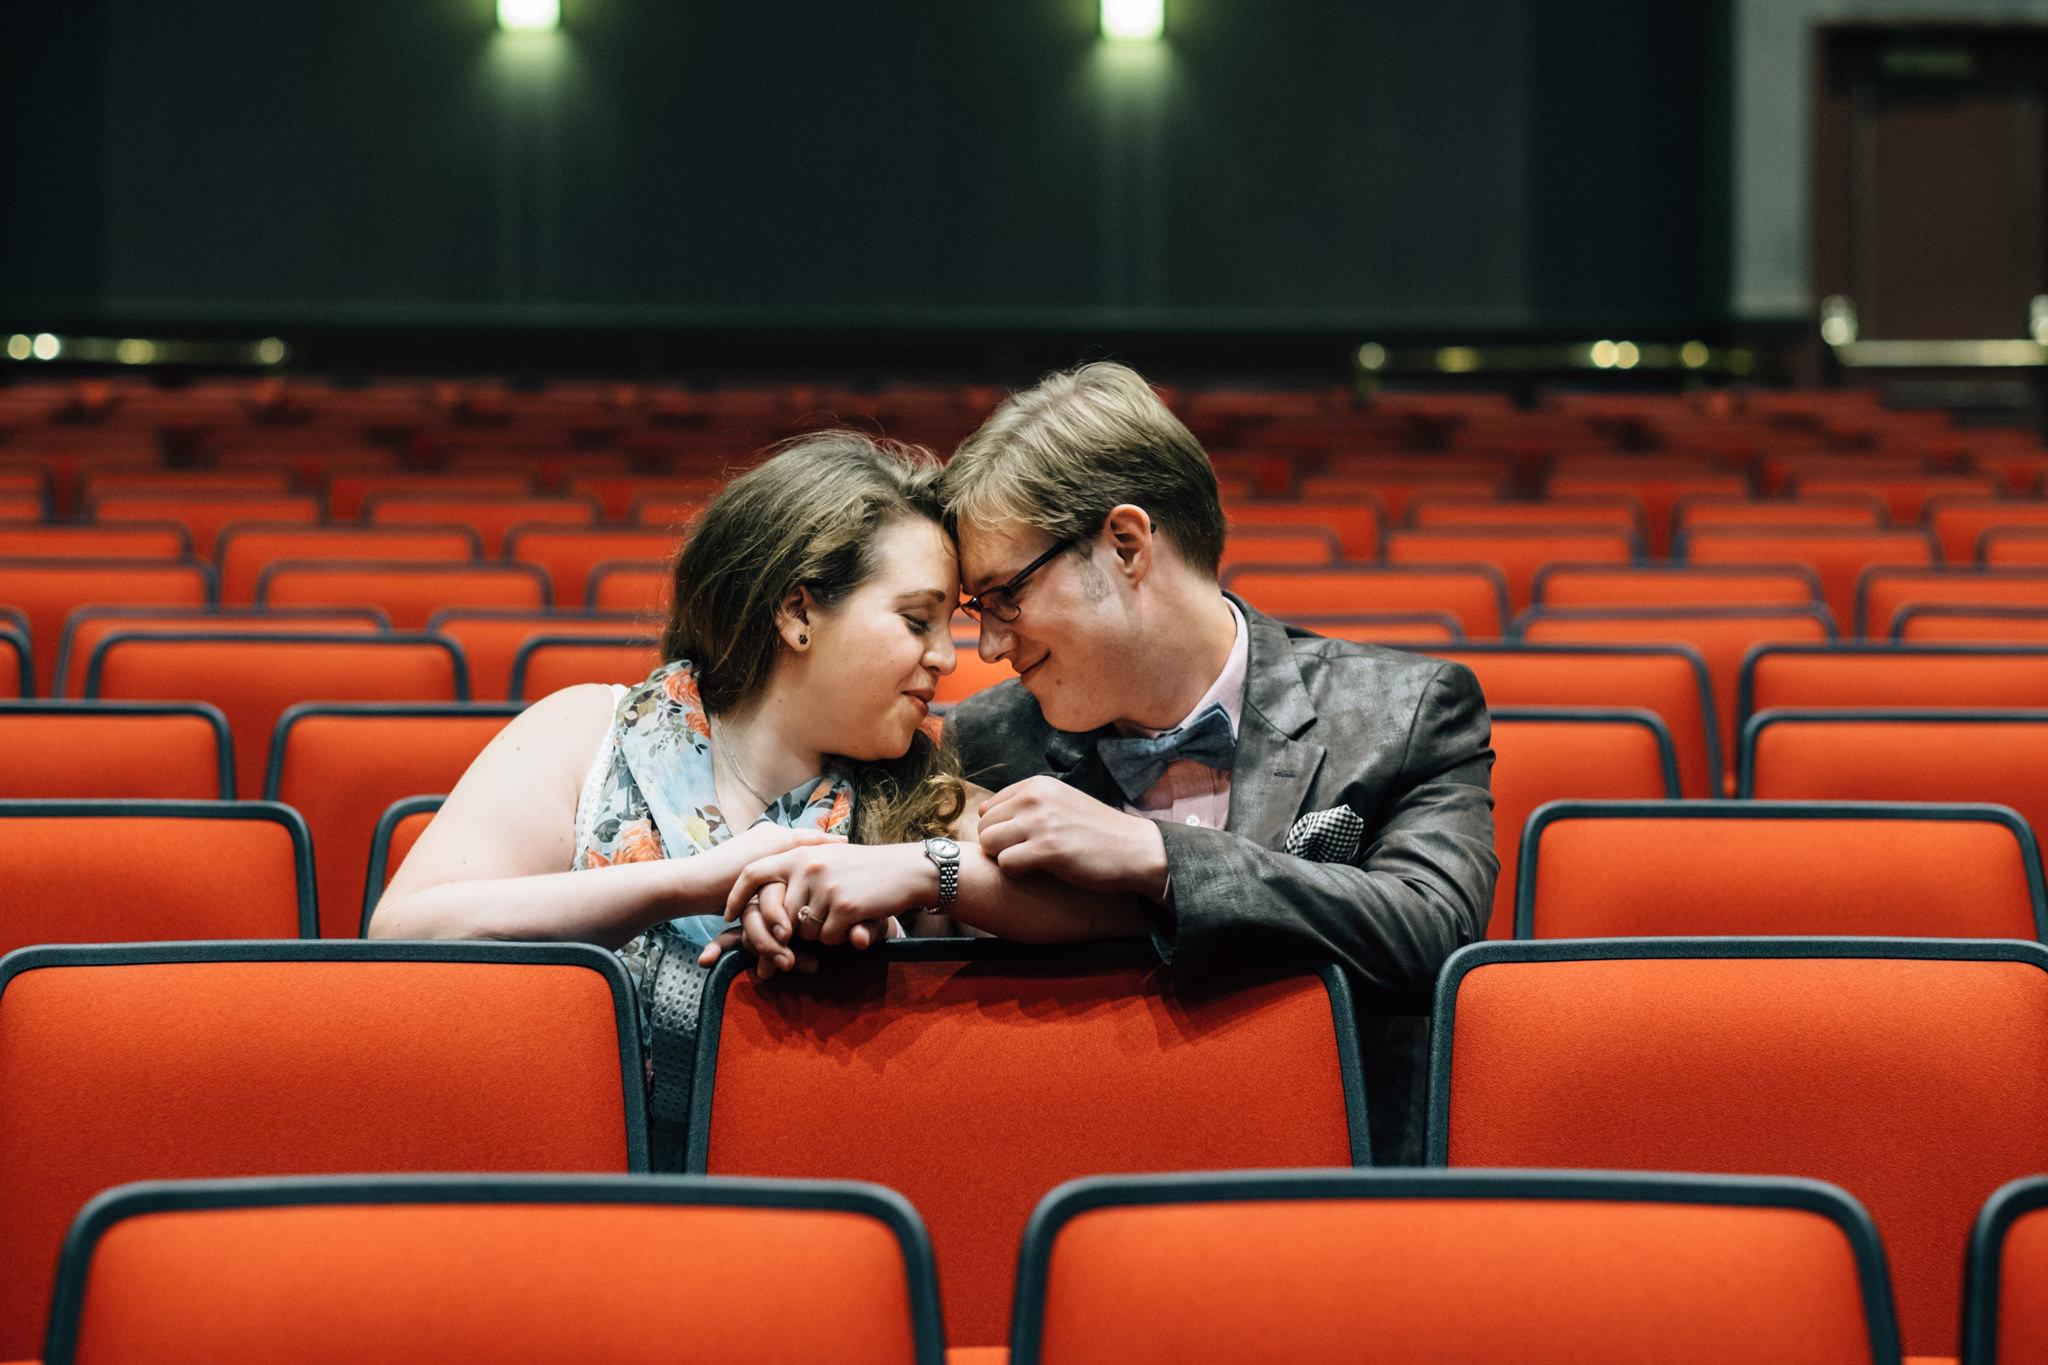 Liz&Shay_Engagement_Blog_016.jpg